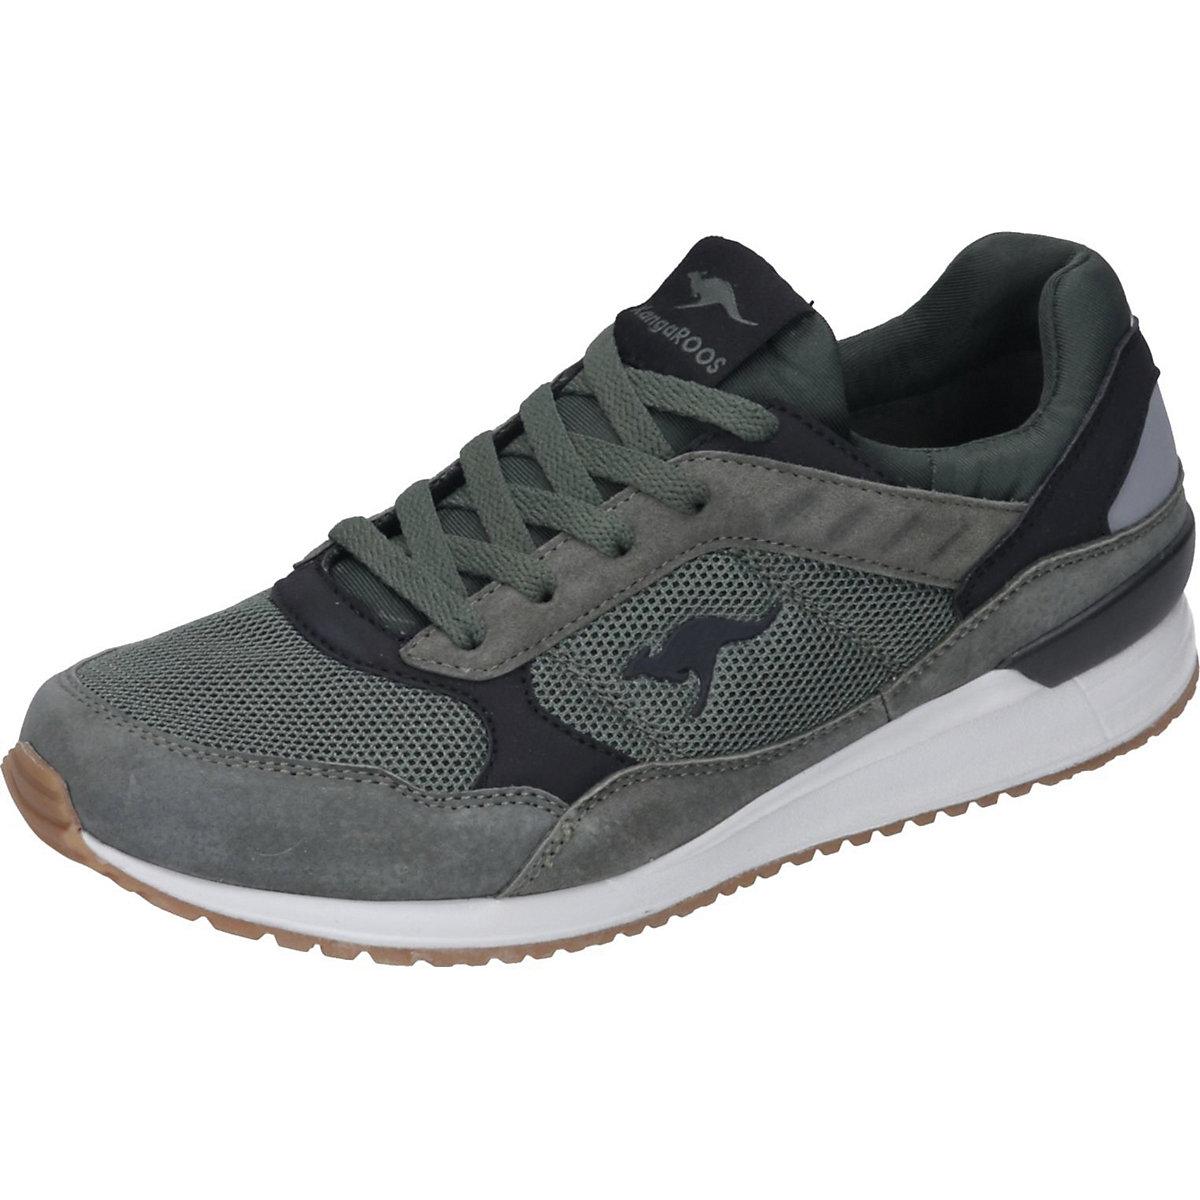 KangaROOS, Schnürschuhe, grün  Gute Qualität beliebte Schuhe